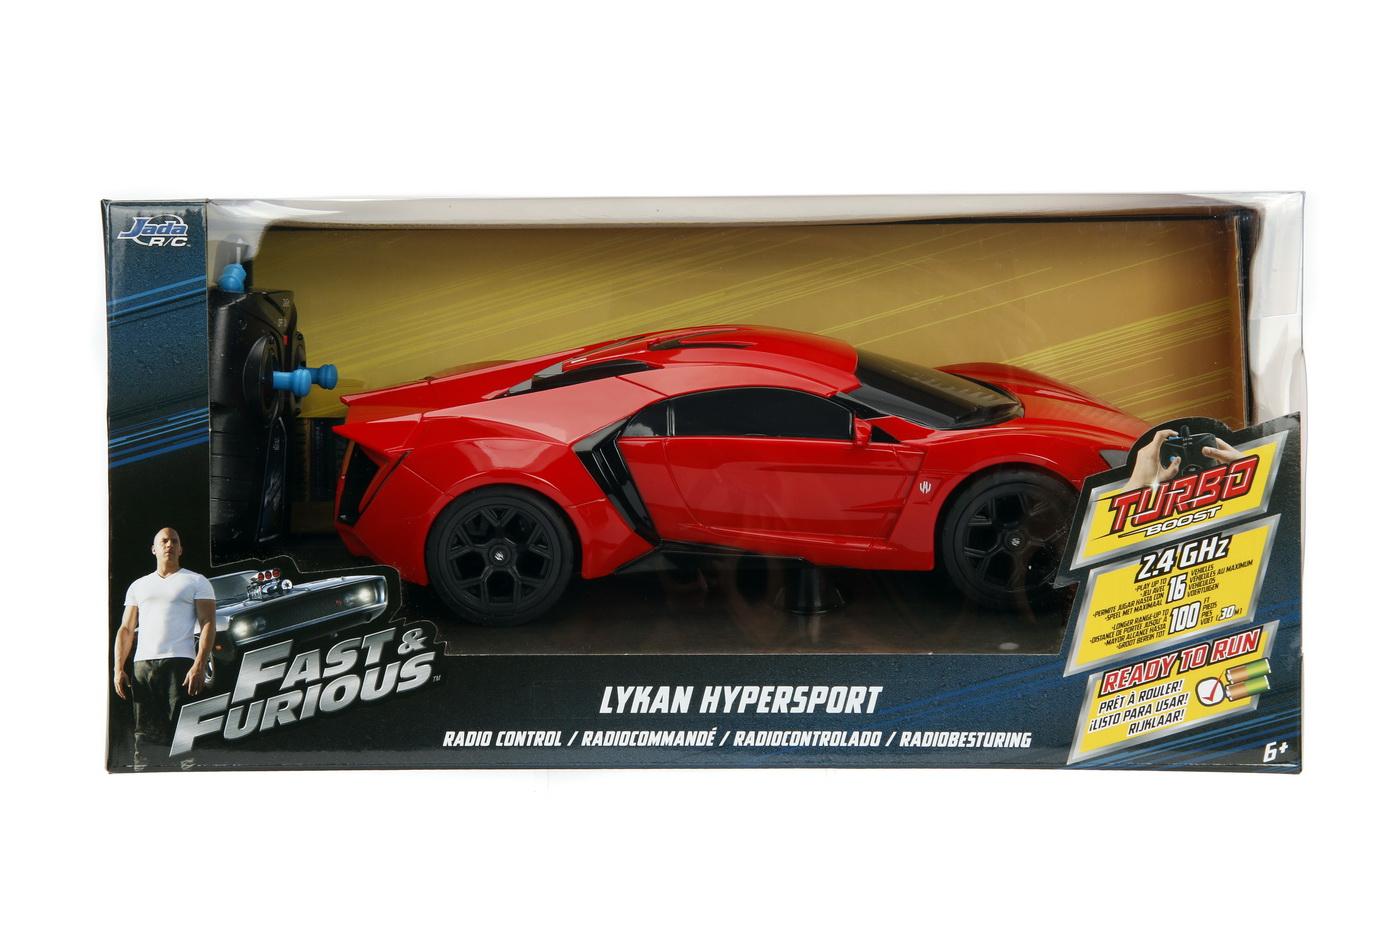 Masinuta Metalica Cu Telecomanda Fast Furious Rc Lykan Hypersport Scara 1:16